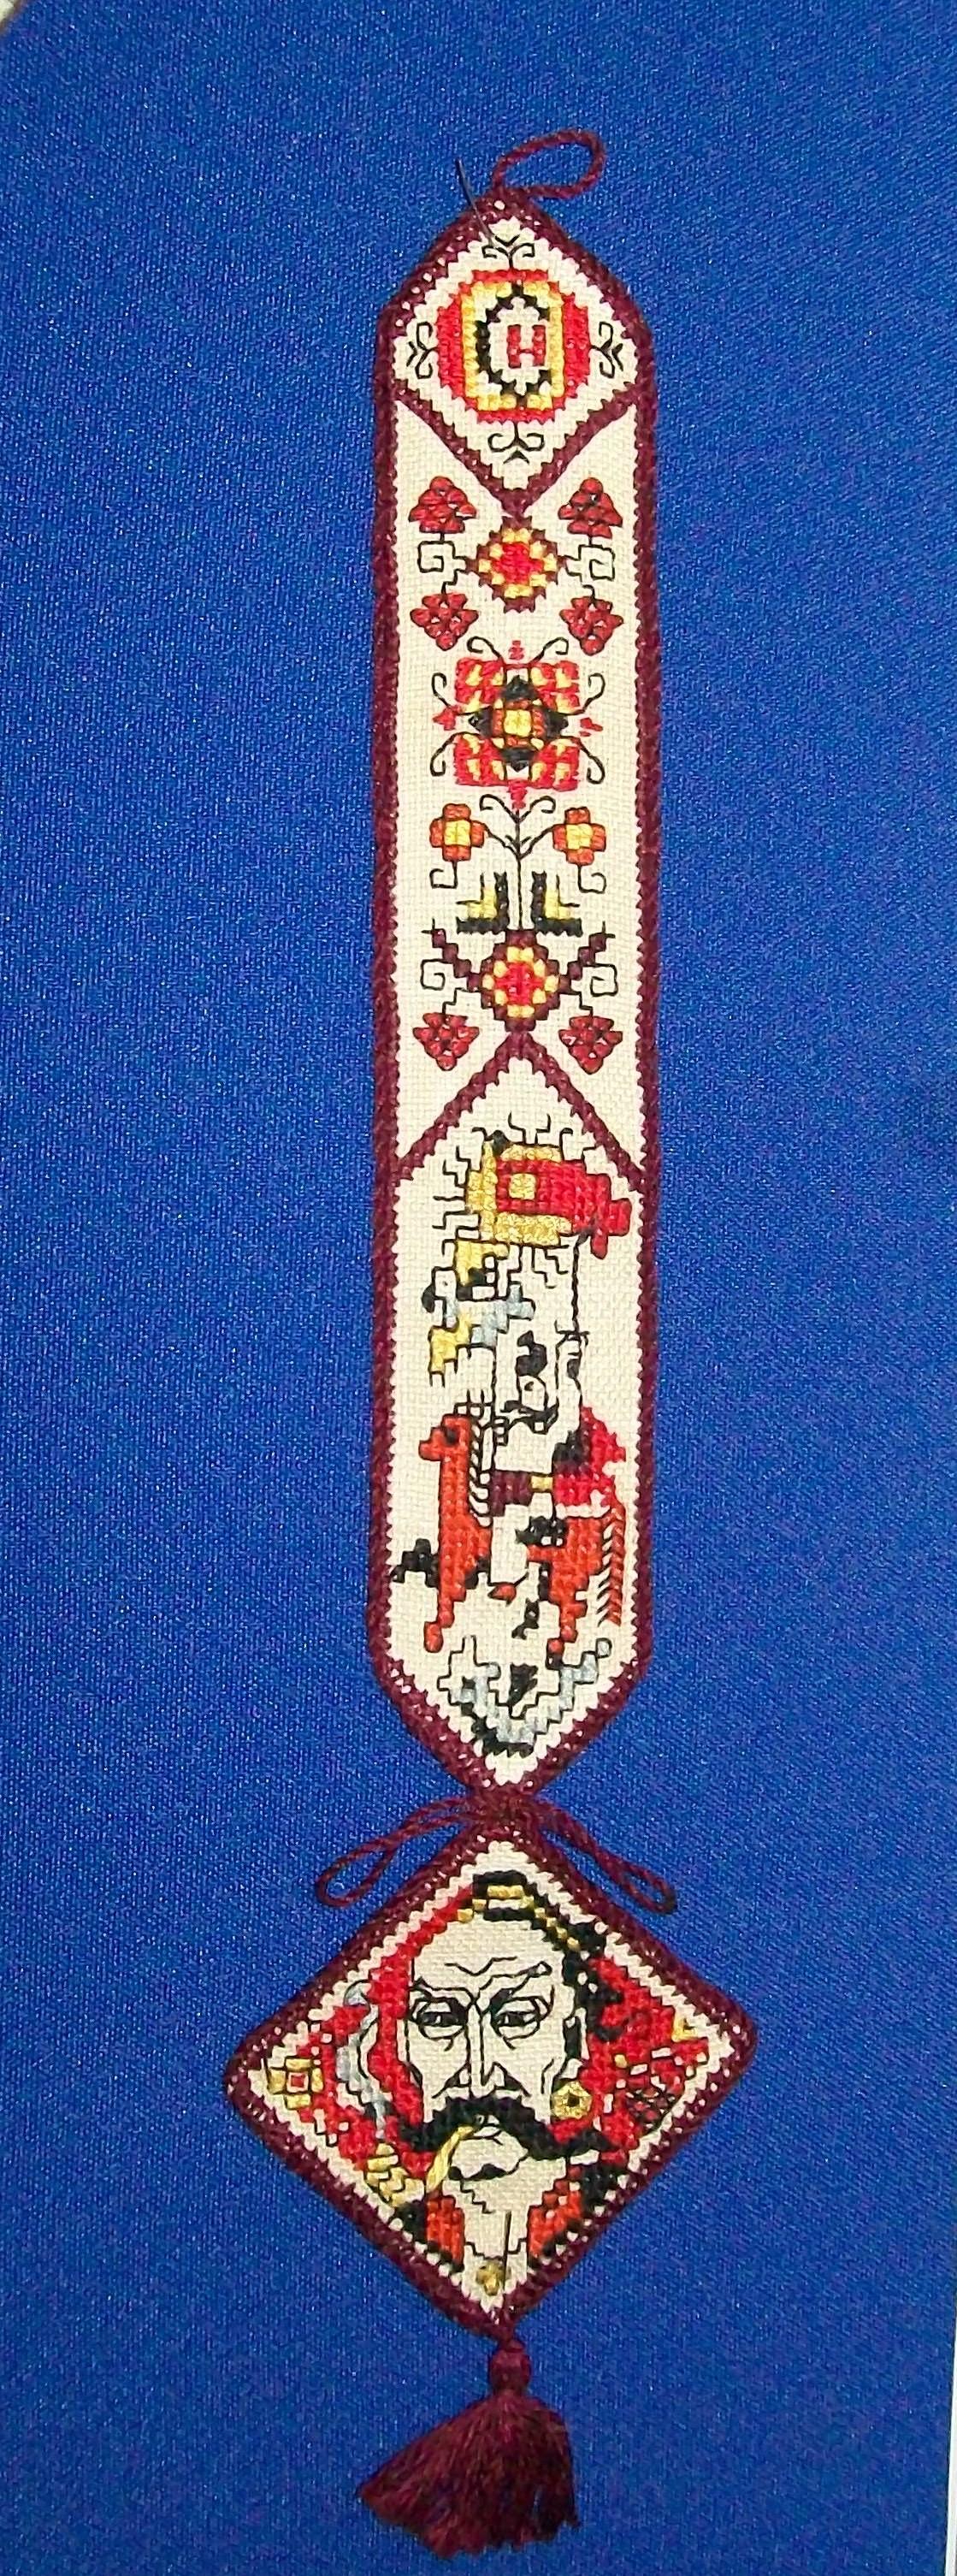 Svitlychna, Nadia. Bookmark embroidered in Mordovia, 1970s. Applied arts object.